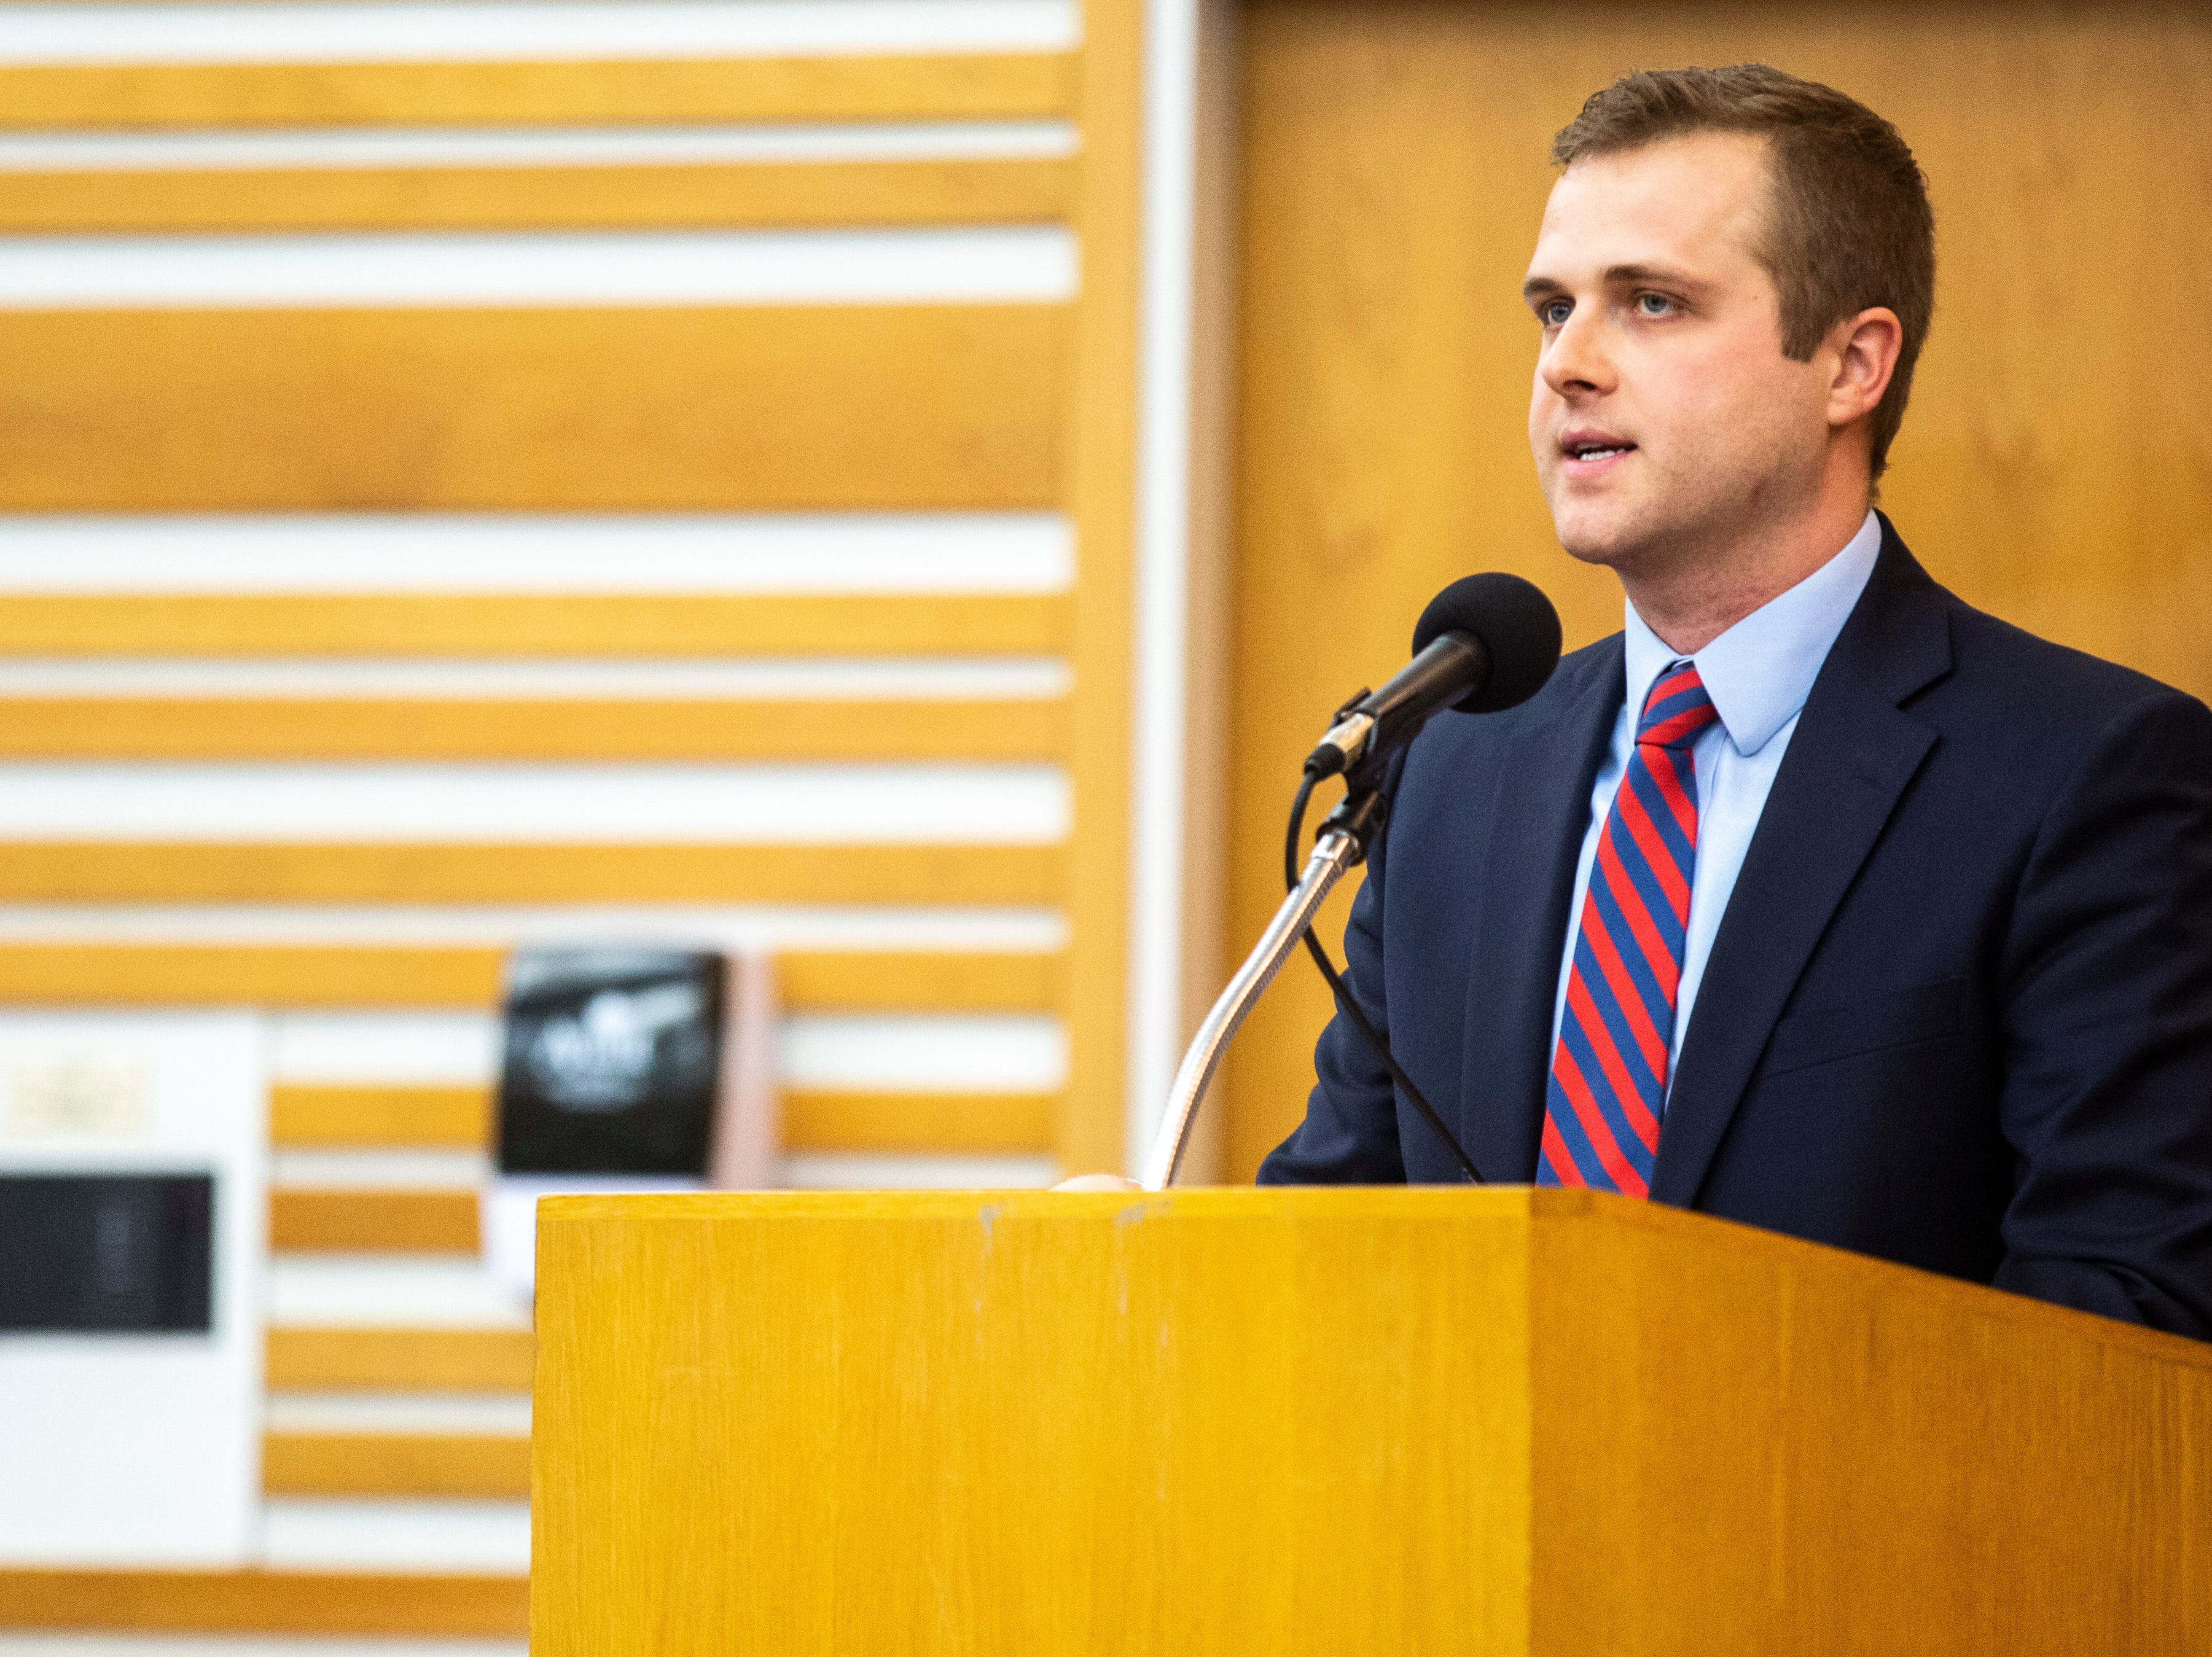 University of Iowa law student Drew Lakin speaks during a panel regarding the Varnum v. Brien Iowa Supreme Court decision, Thursday, April 18, 2019, in the Boyd Law Building on the University of Iowa campus in Iowa City, Iowa.